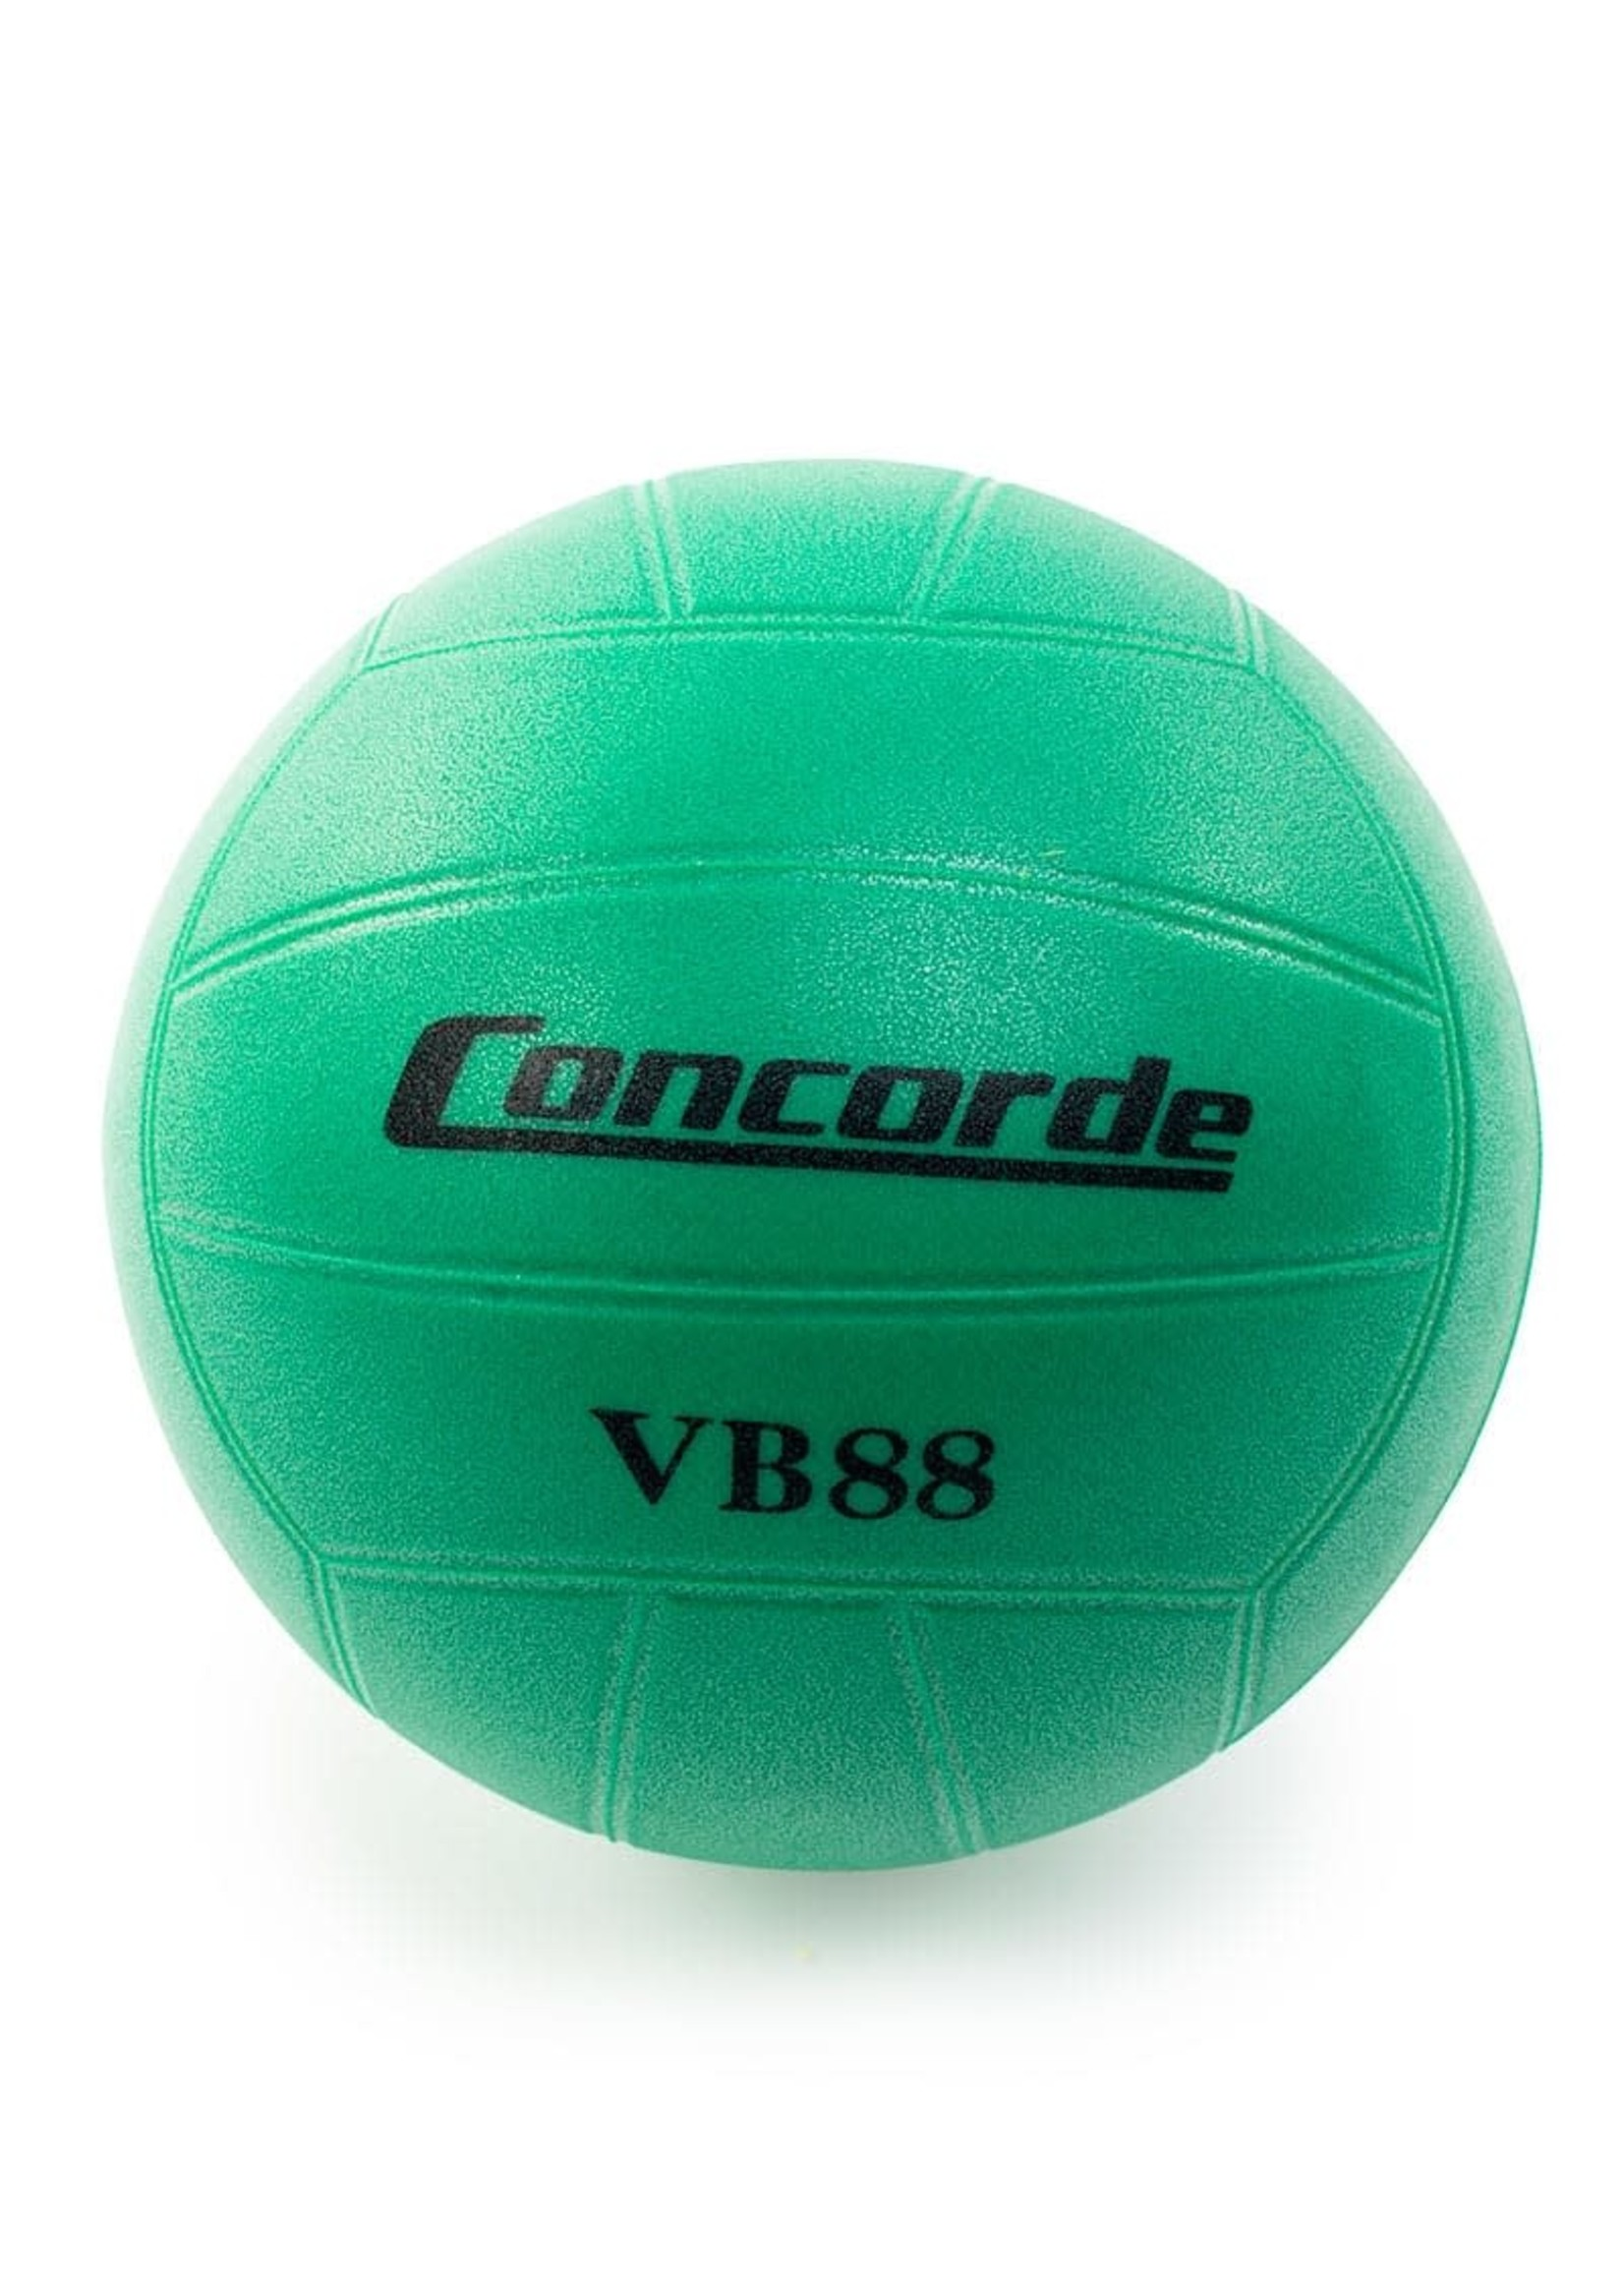 360 ATHLETICS 360 VOLLEYBALL SOFT VINYL CONCORDE GREEN